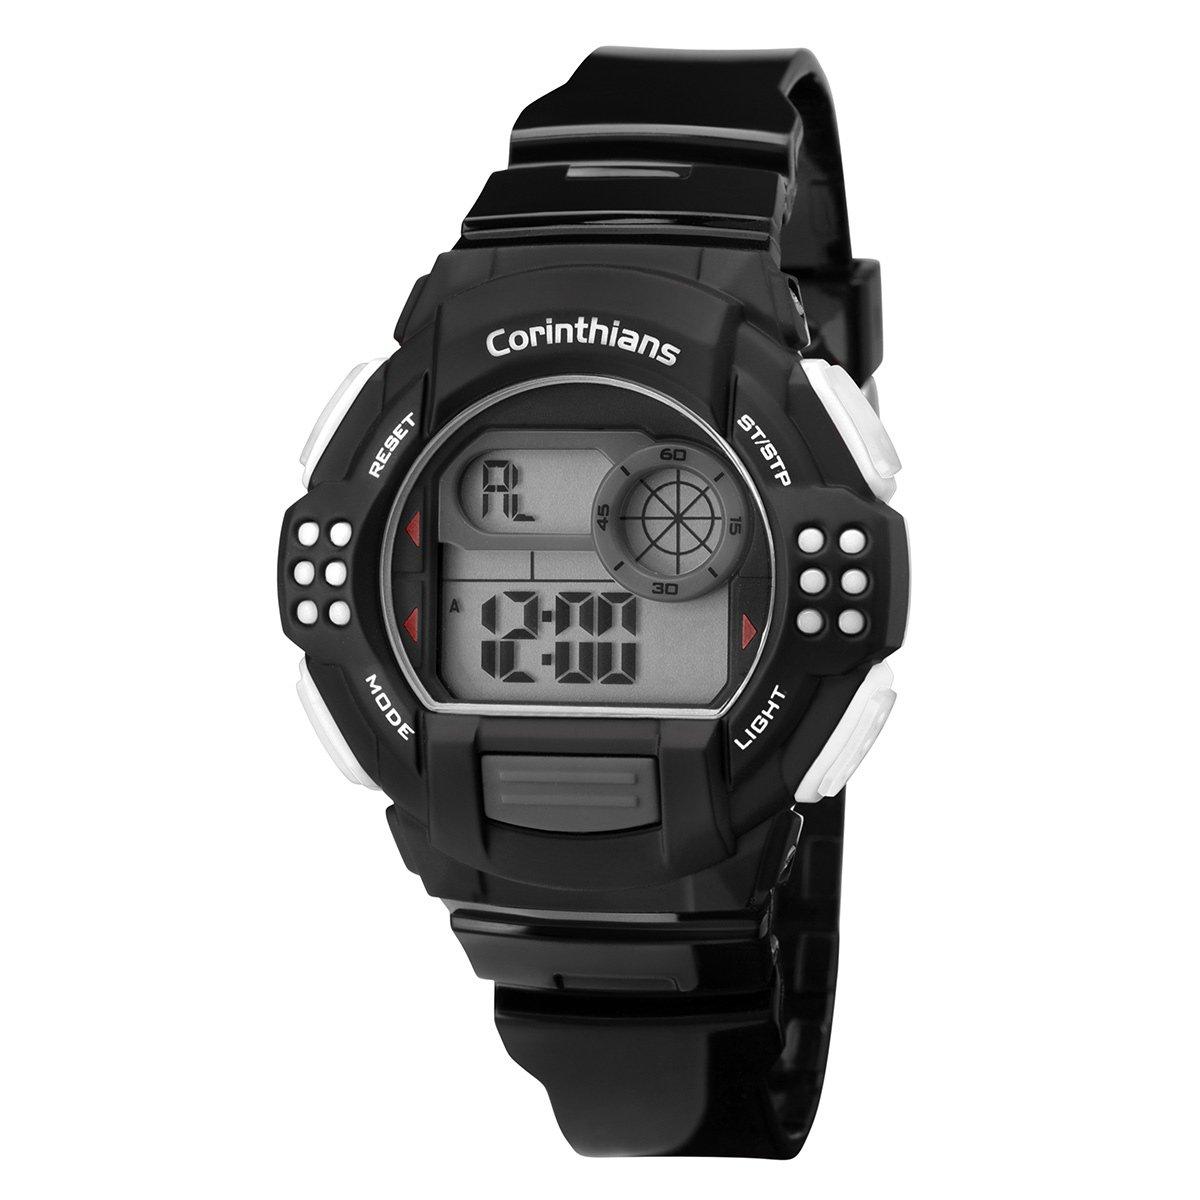 b6d0f13a97d Relógio Technos Corinthians Digital III - Compre Agora